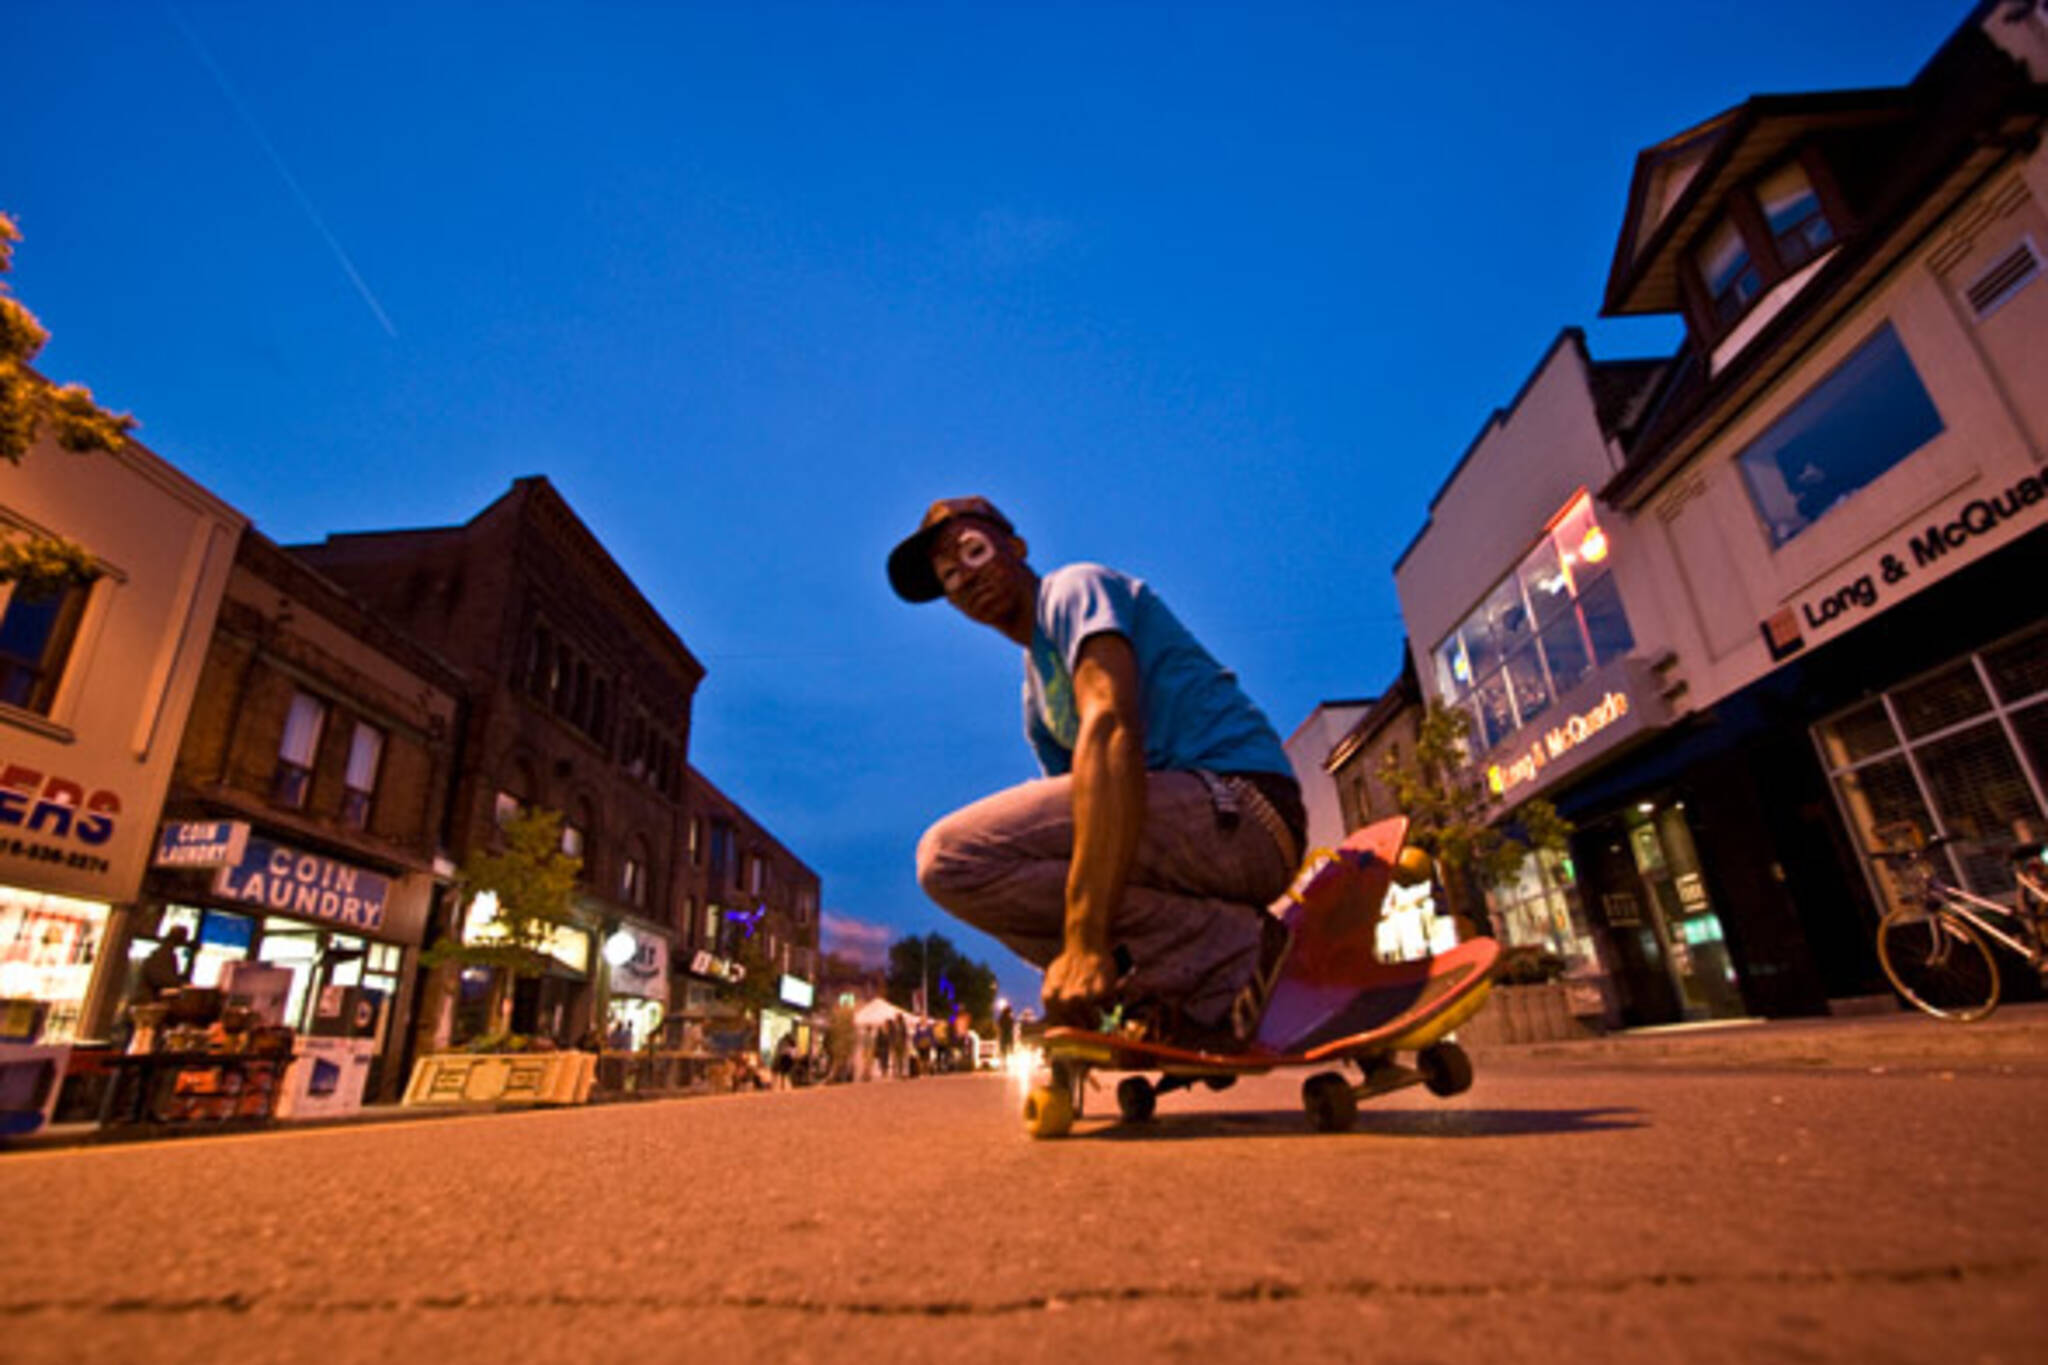 toronto skateboarder